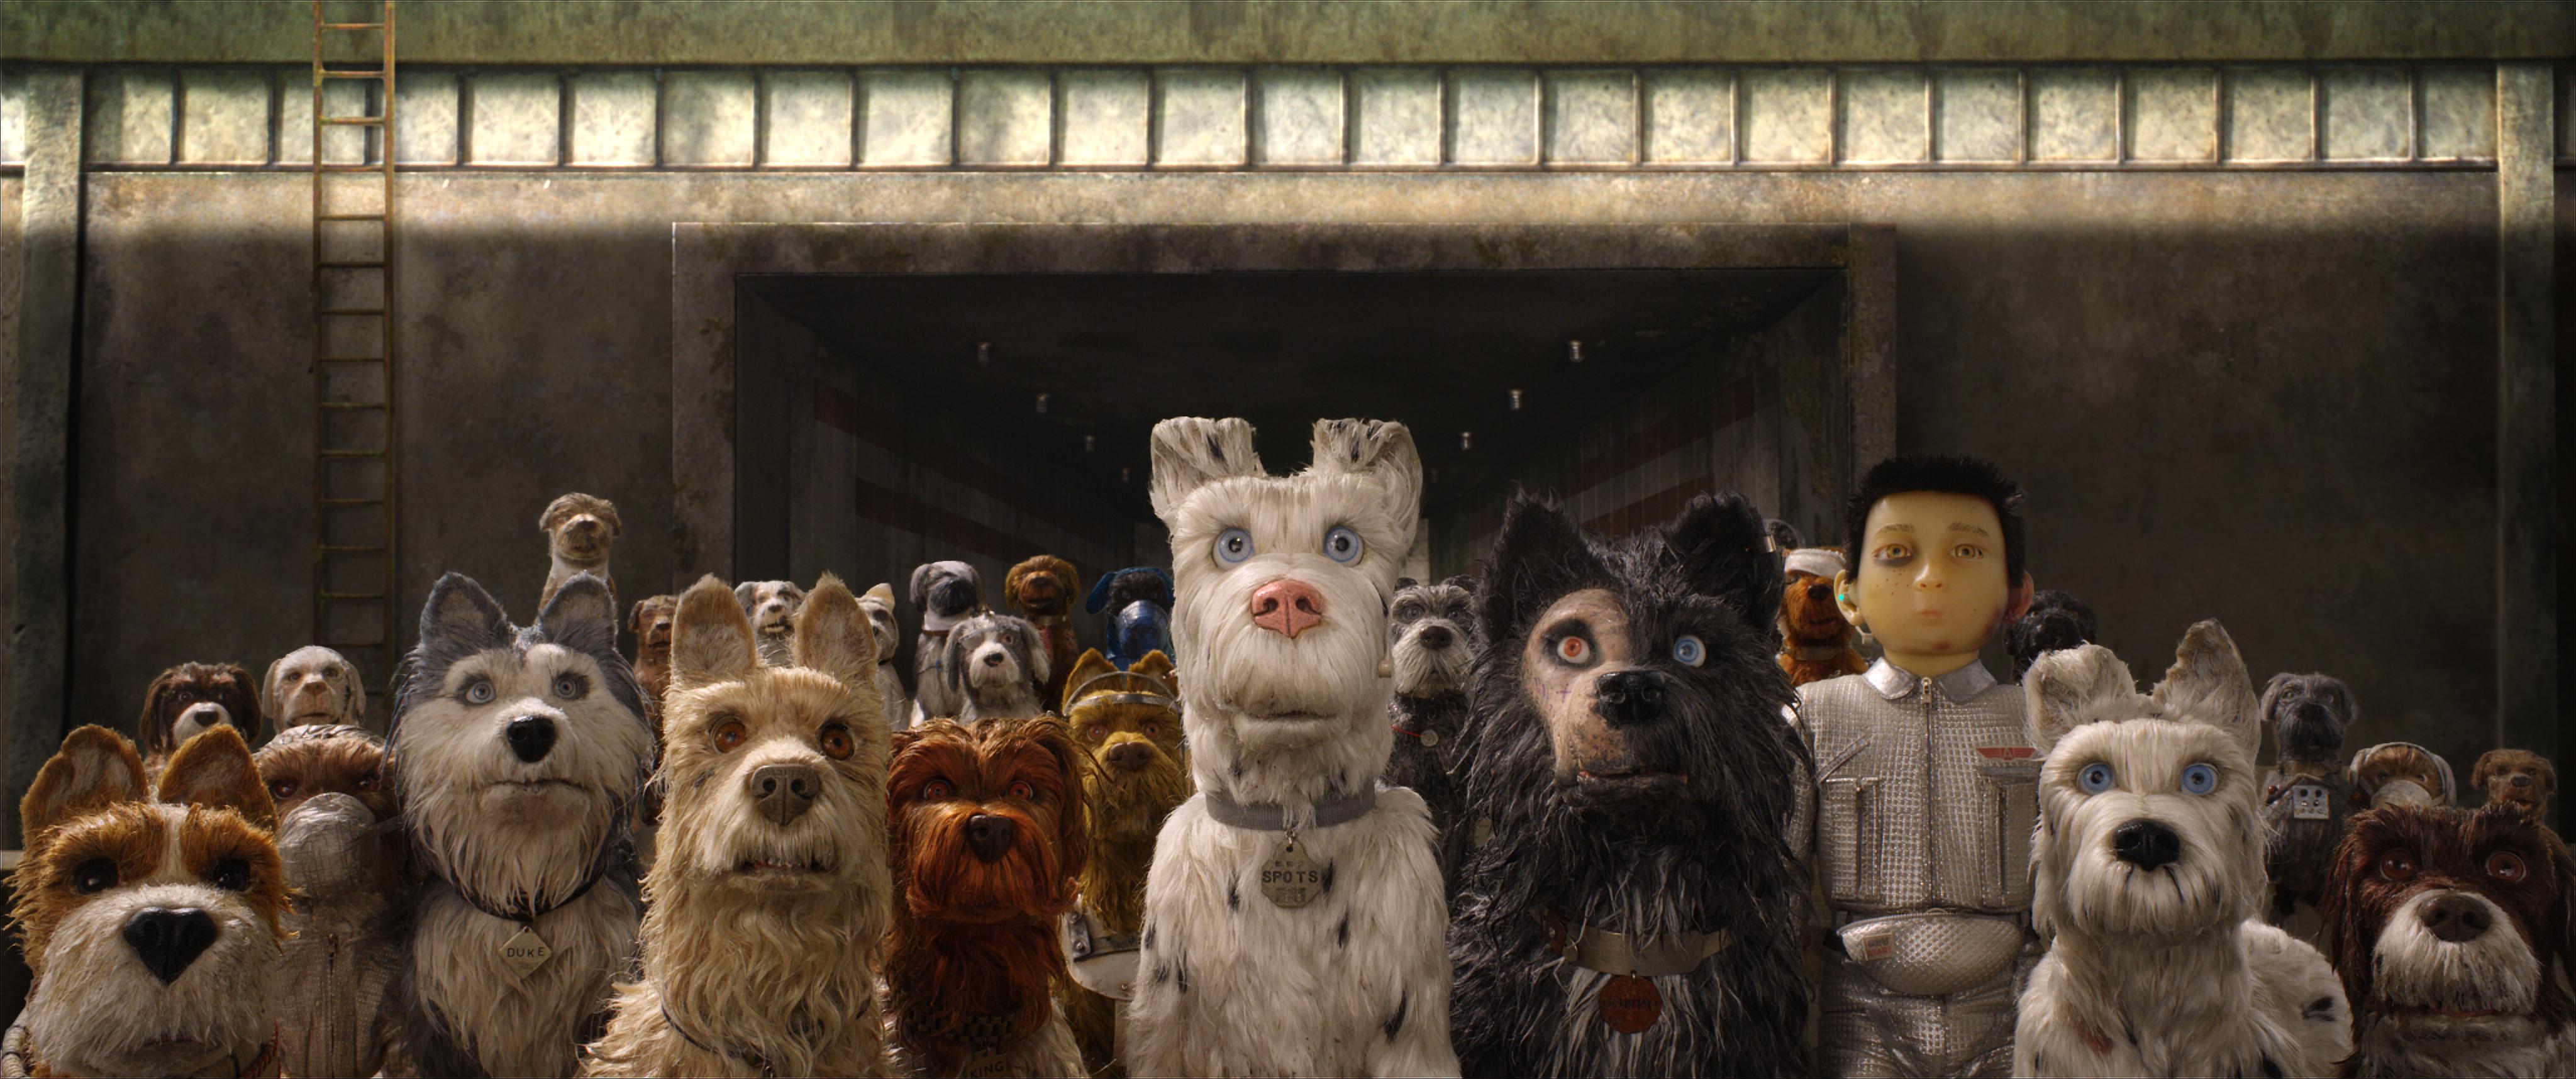 Bill Murray as 'Boss,' Jeff Goldblum as 'Duke,' Edward Norton as 'Rex,' Bob Balaban as 'King,' Liev Shreiber as 'Spots,' Harvey Keitel as 'Gondo,' Koyu Rankin as 'Atari Kobayashi' and Bryan Cranston as 'Chief' in Wes Anderson's Isle of Dogs.